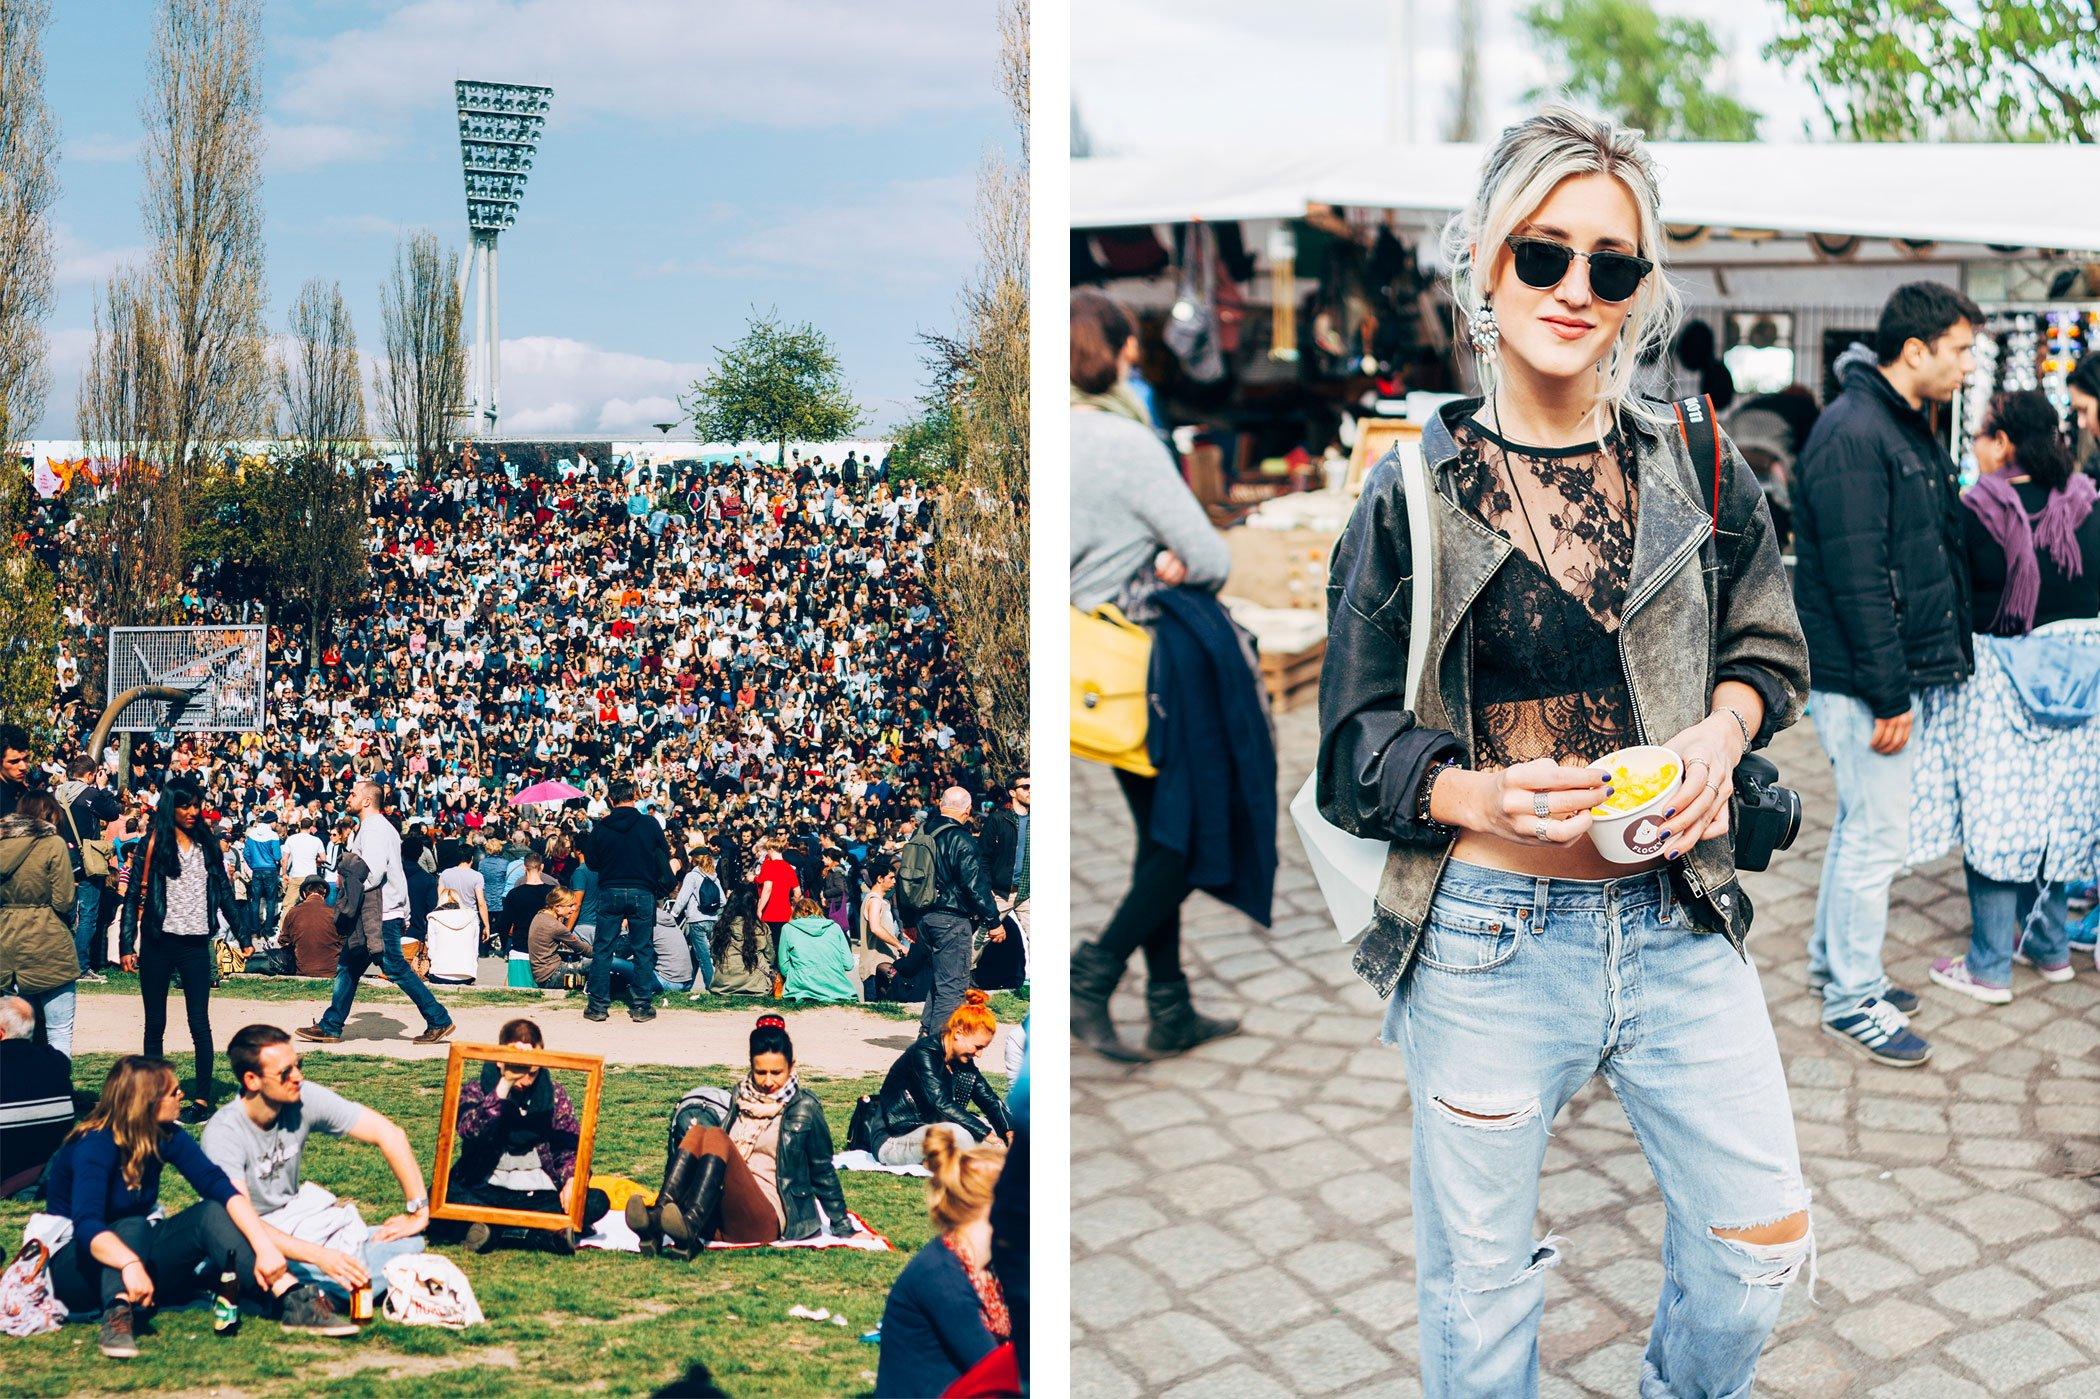 mikuta having fun in mauerpark berlin